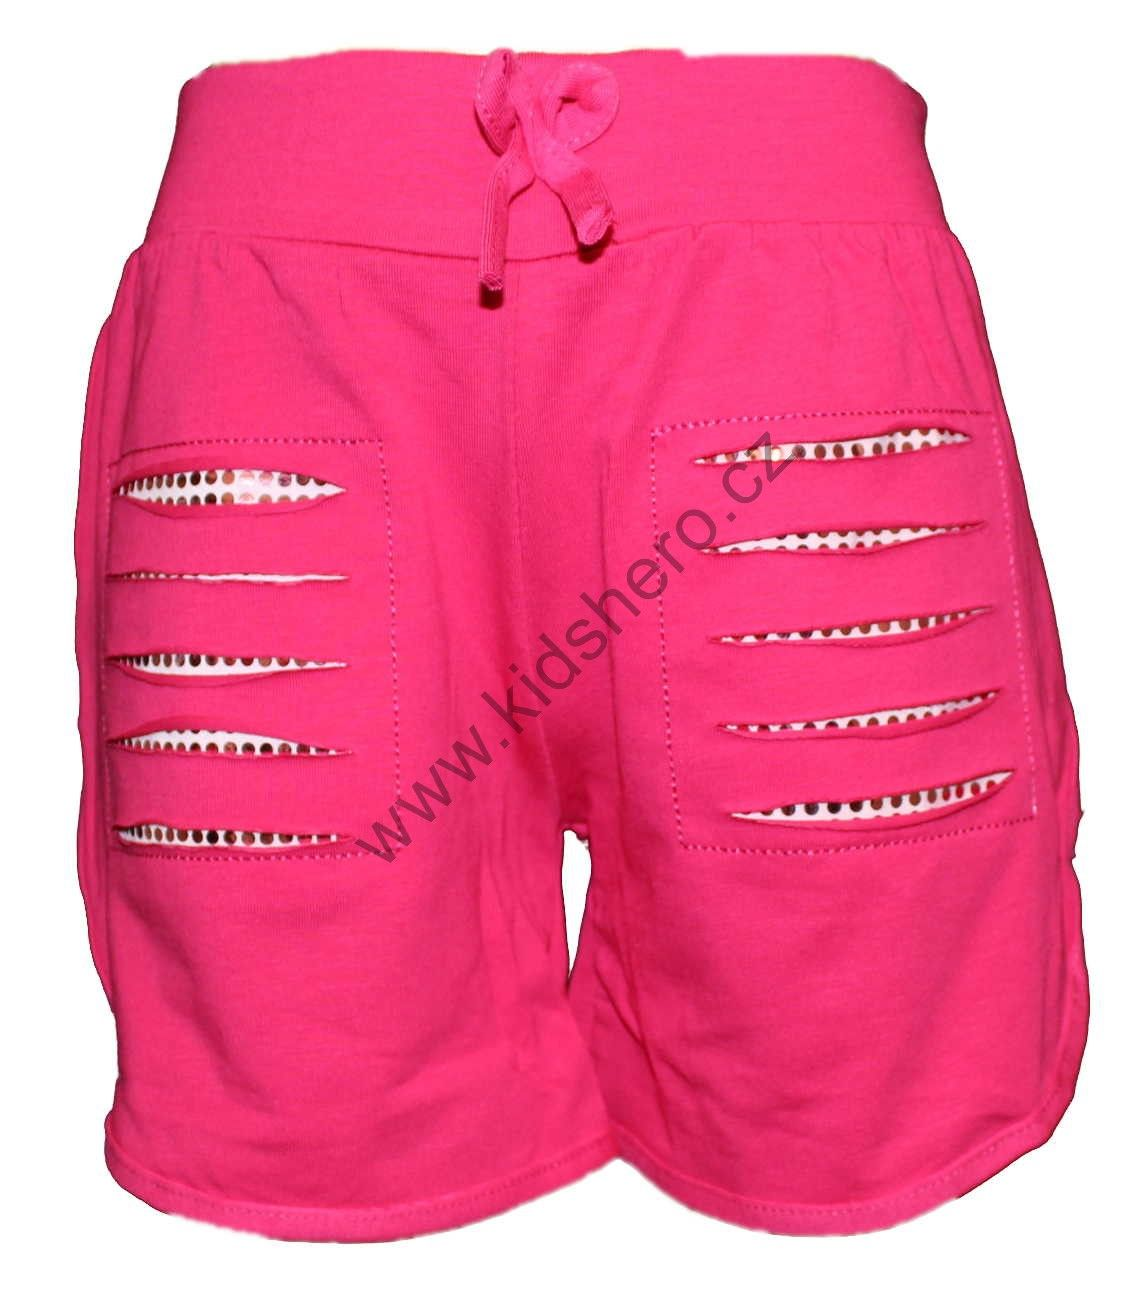 dívčí kraťasy bavlněné kraťasy dětské šortky